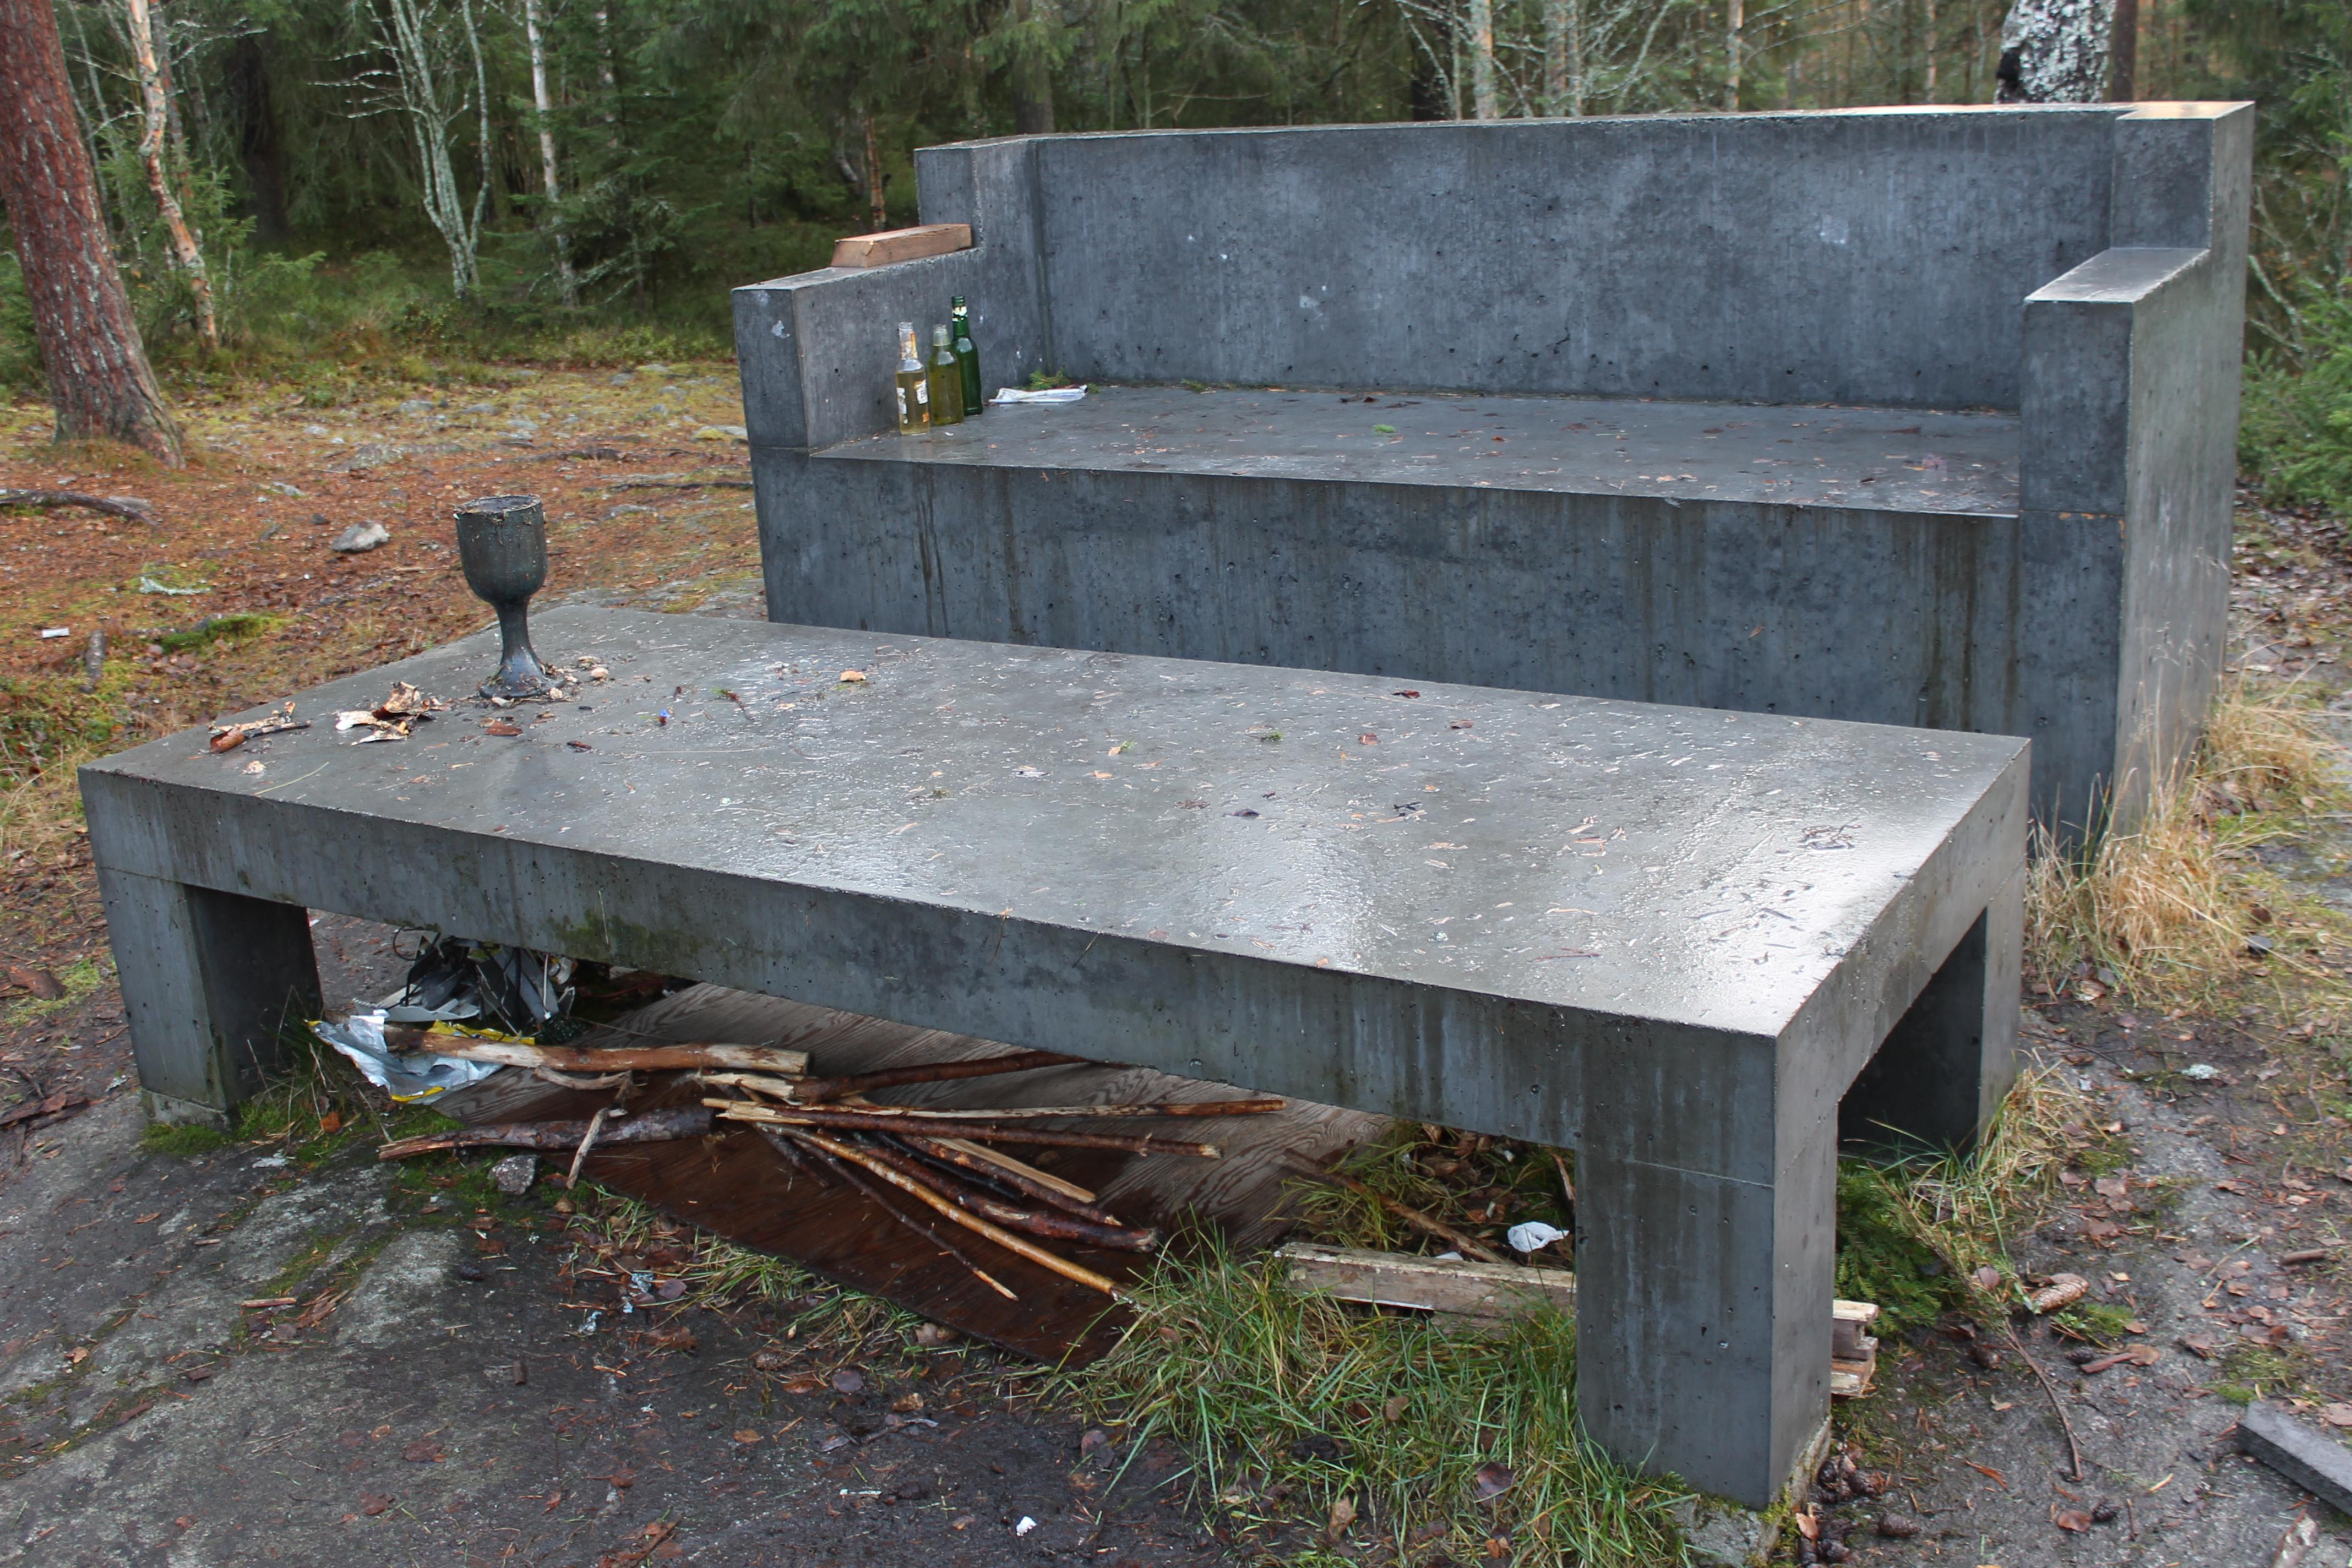 File:Concrete Sofa, Ålidhem.JPG